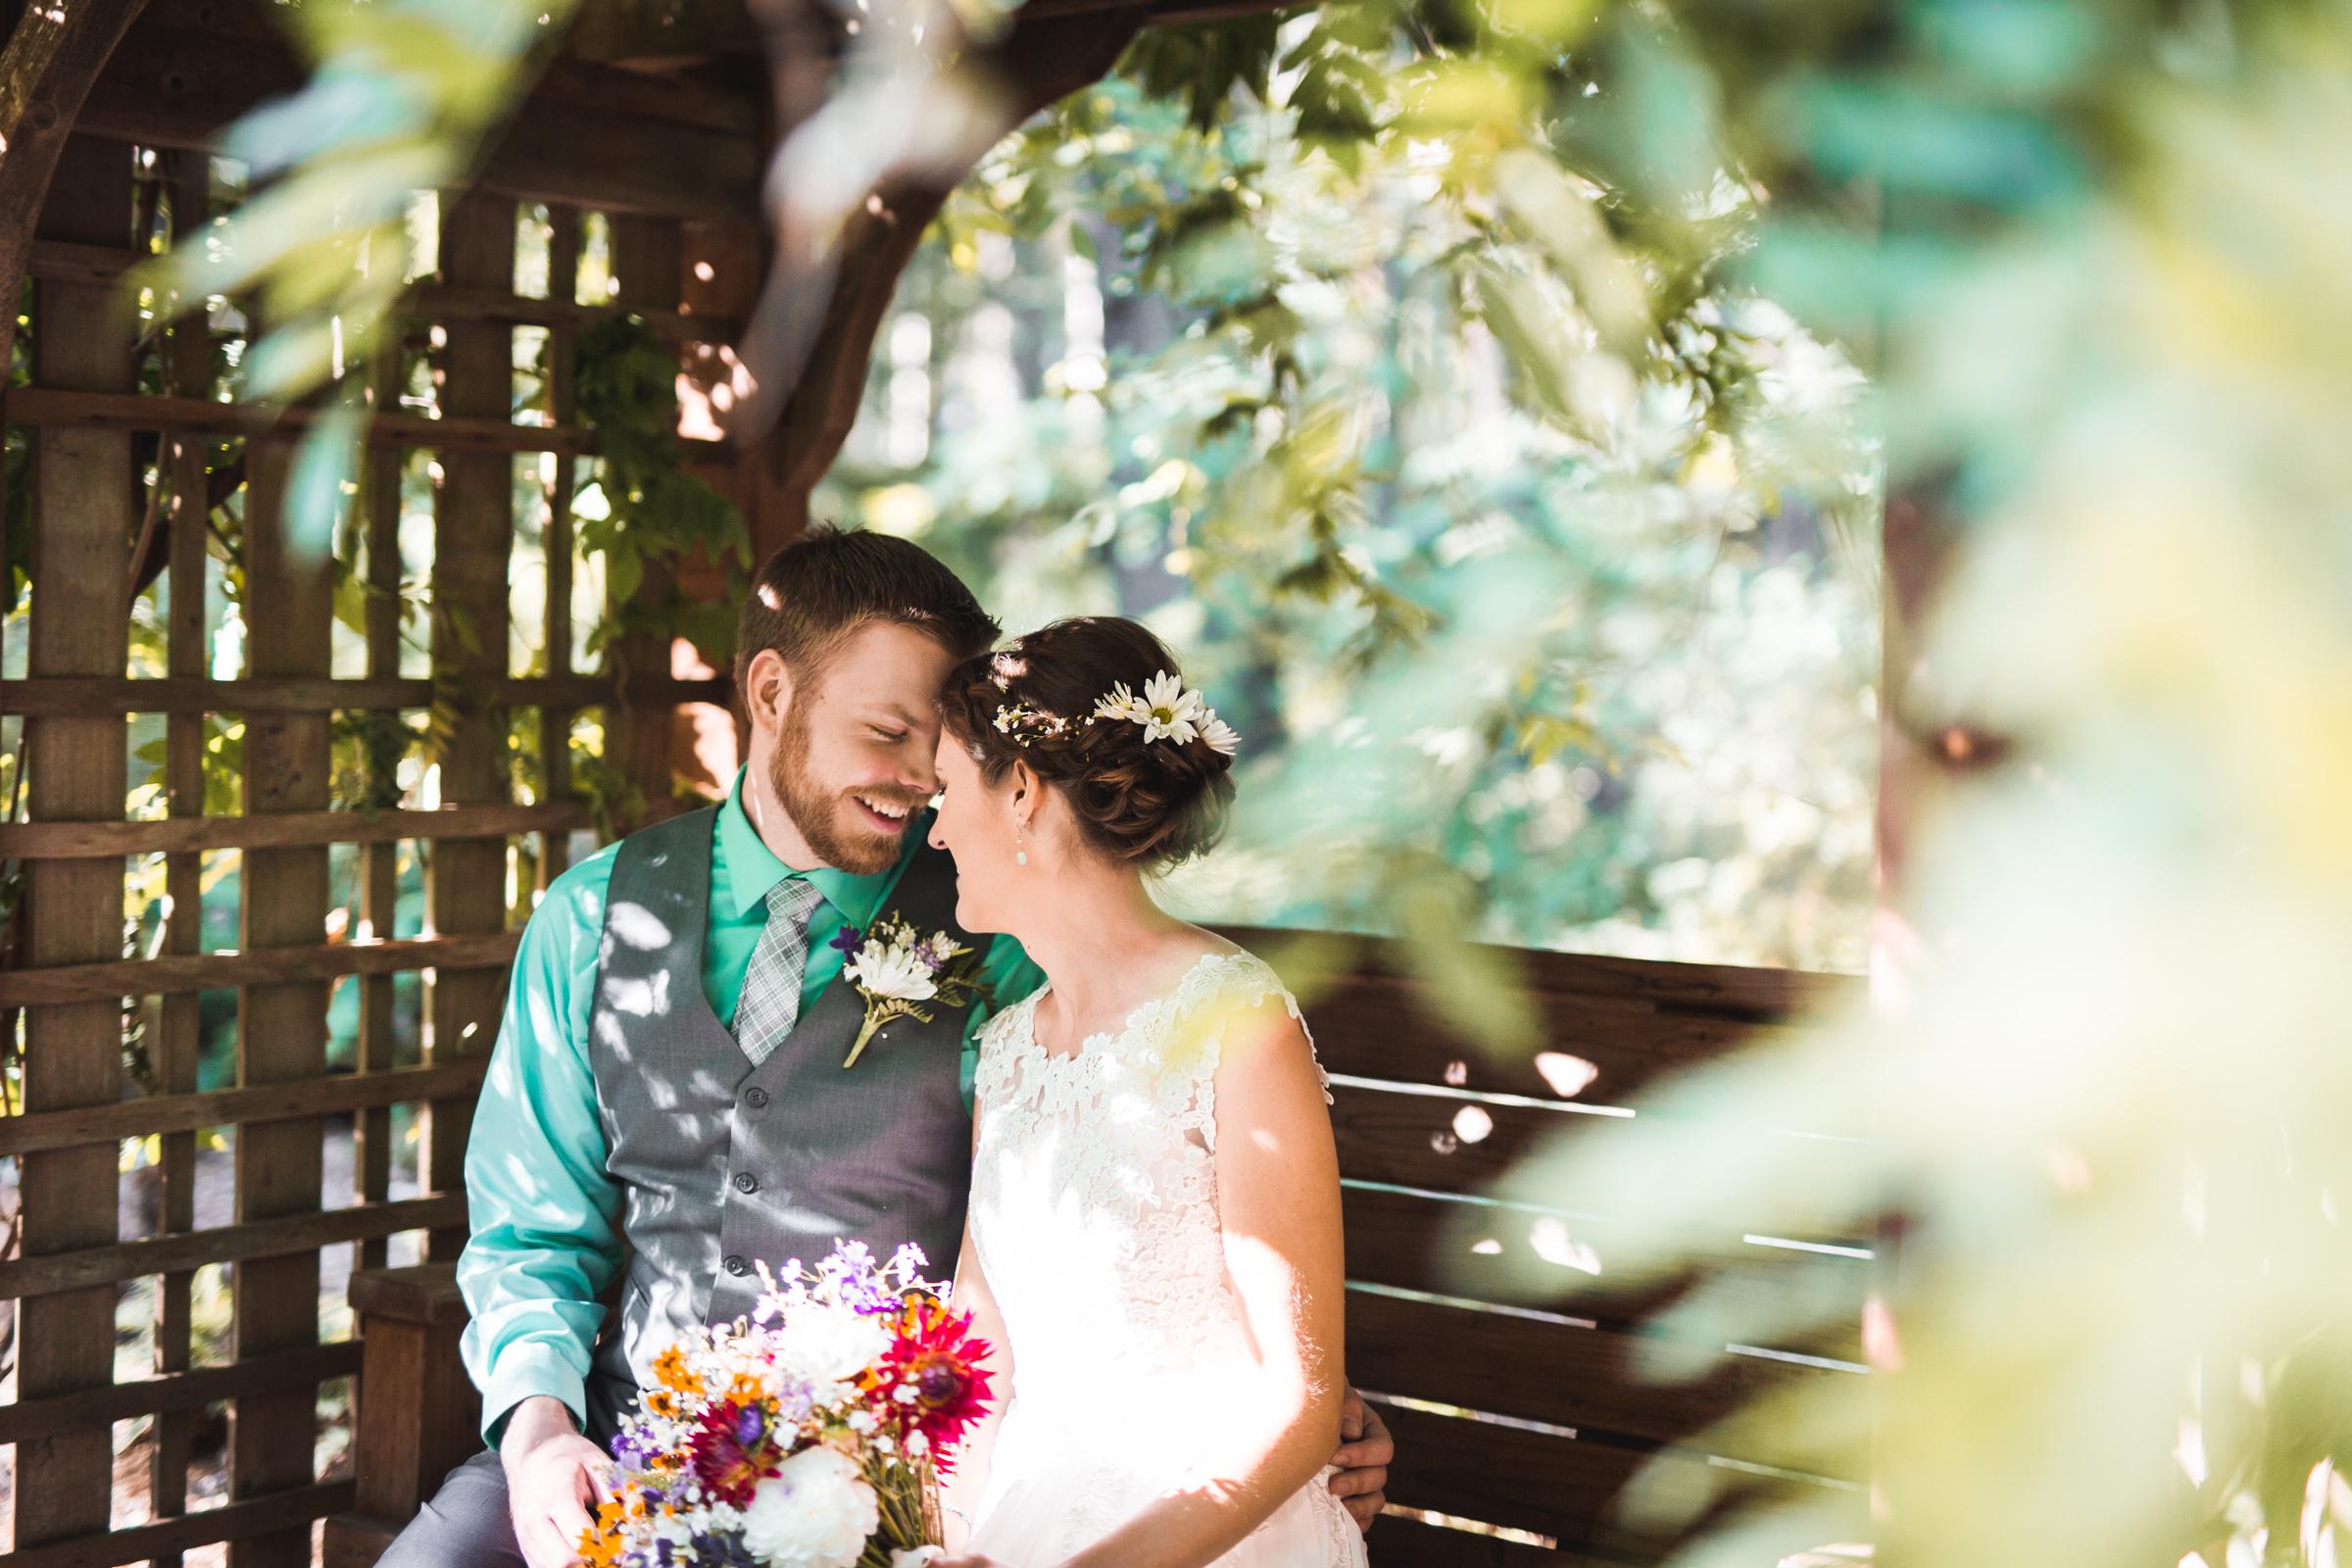 LukeSarah-Seattle-Wedding-080516-0137.jpg